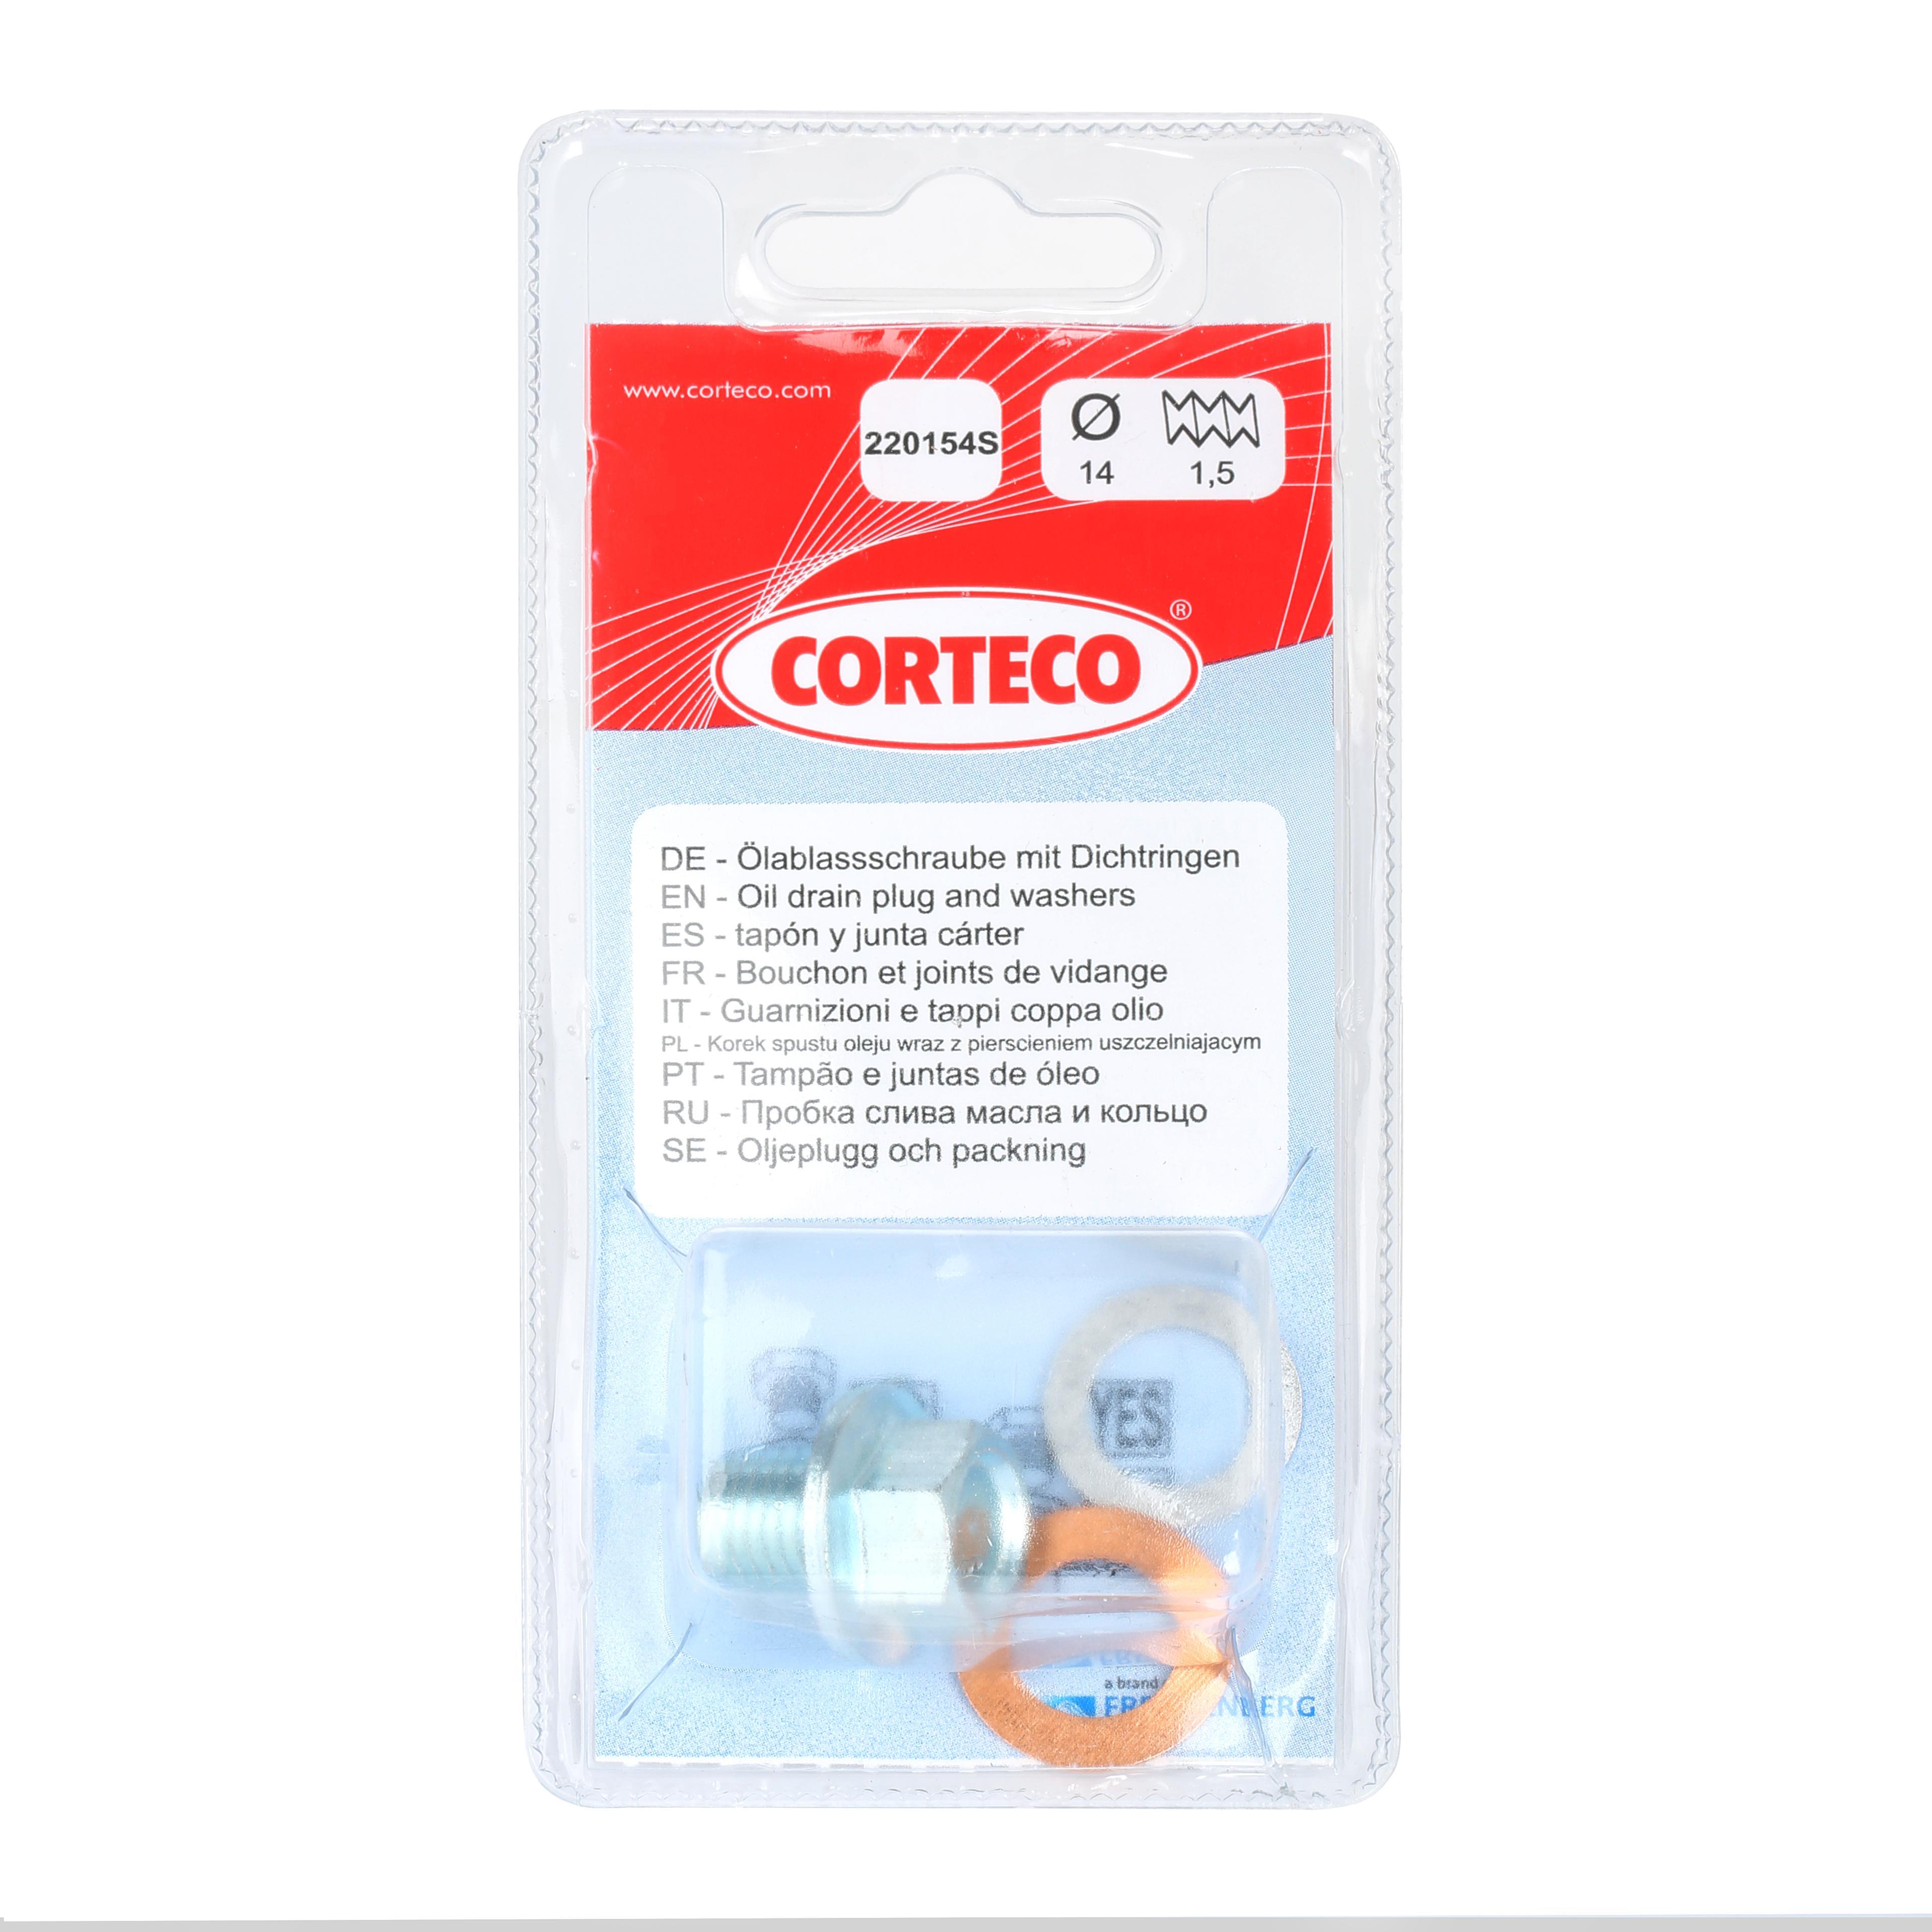 CORTECO: Original Ablassschraube Öl 220154S ()